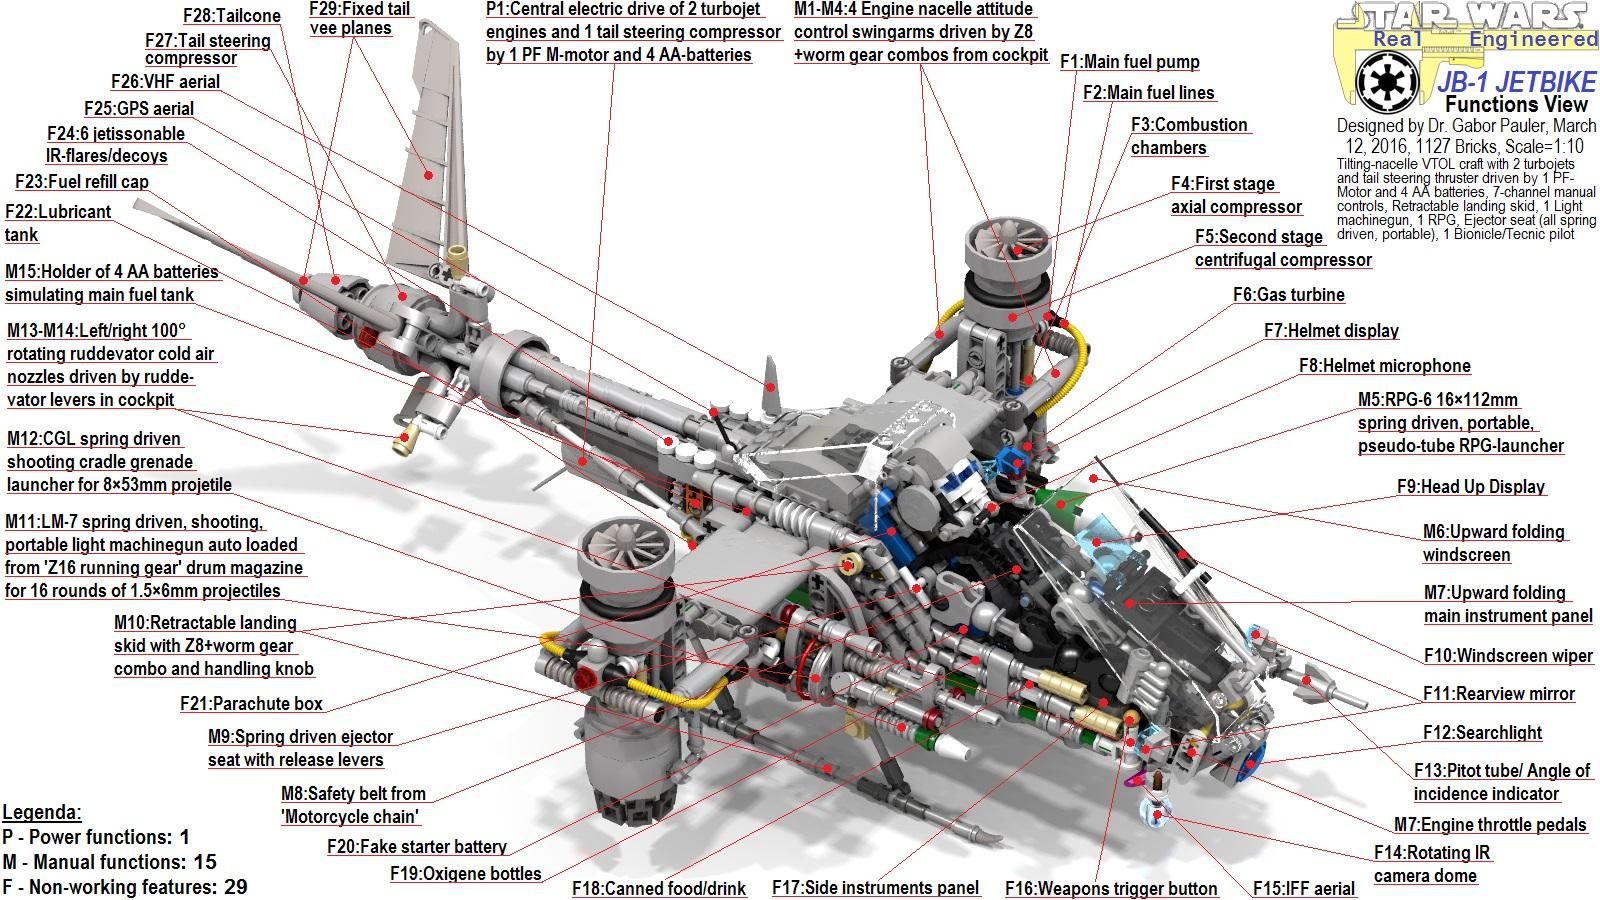 Functional overview of JB-1 Tilting Nacelle VTOL Jet Bike